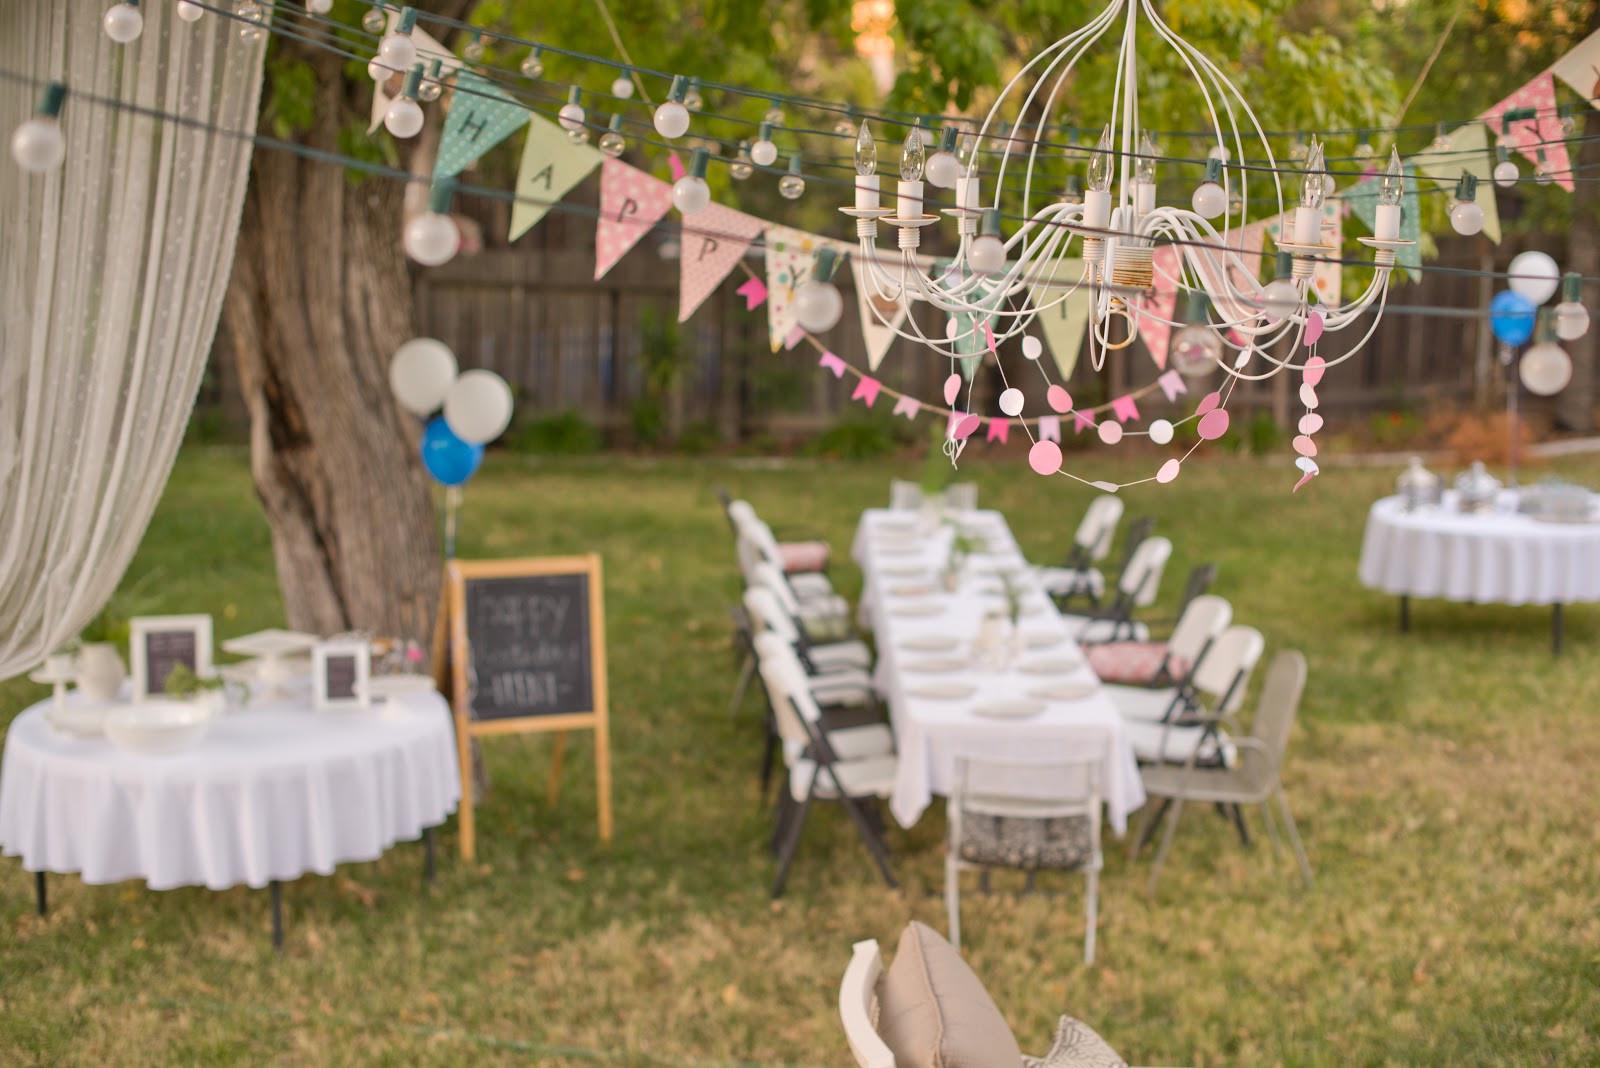 Backyard Kid Party Ideas  Domestic Fashionista 31 Days of Creative Homemaking